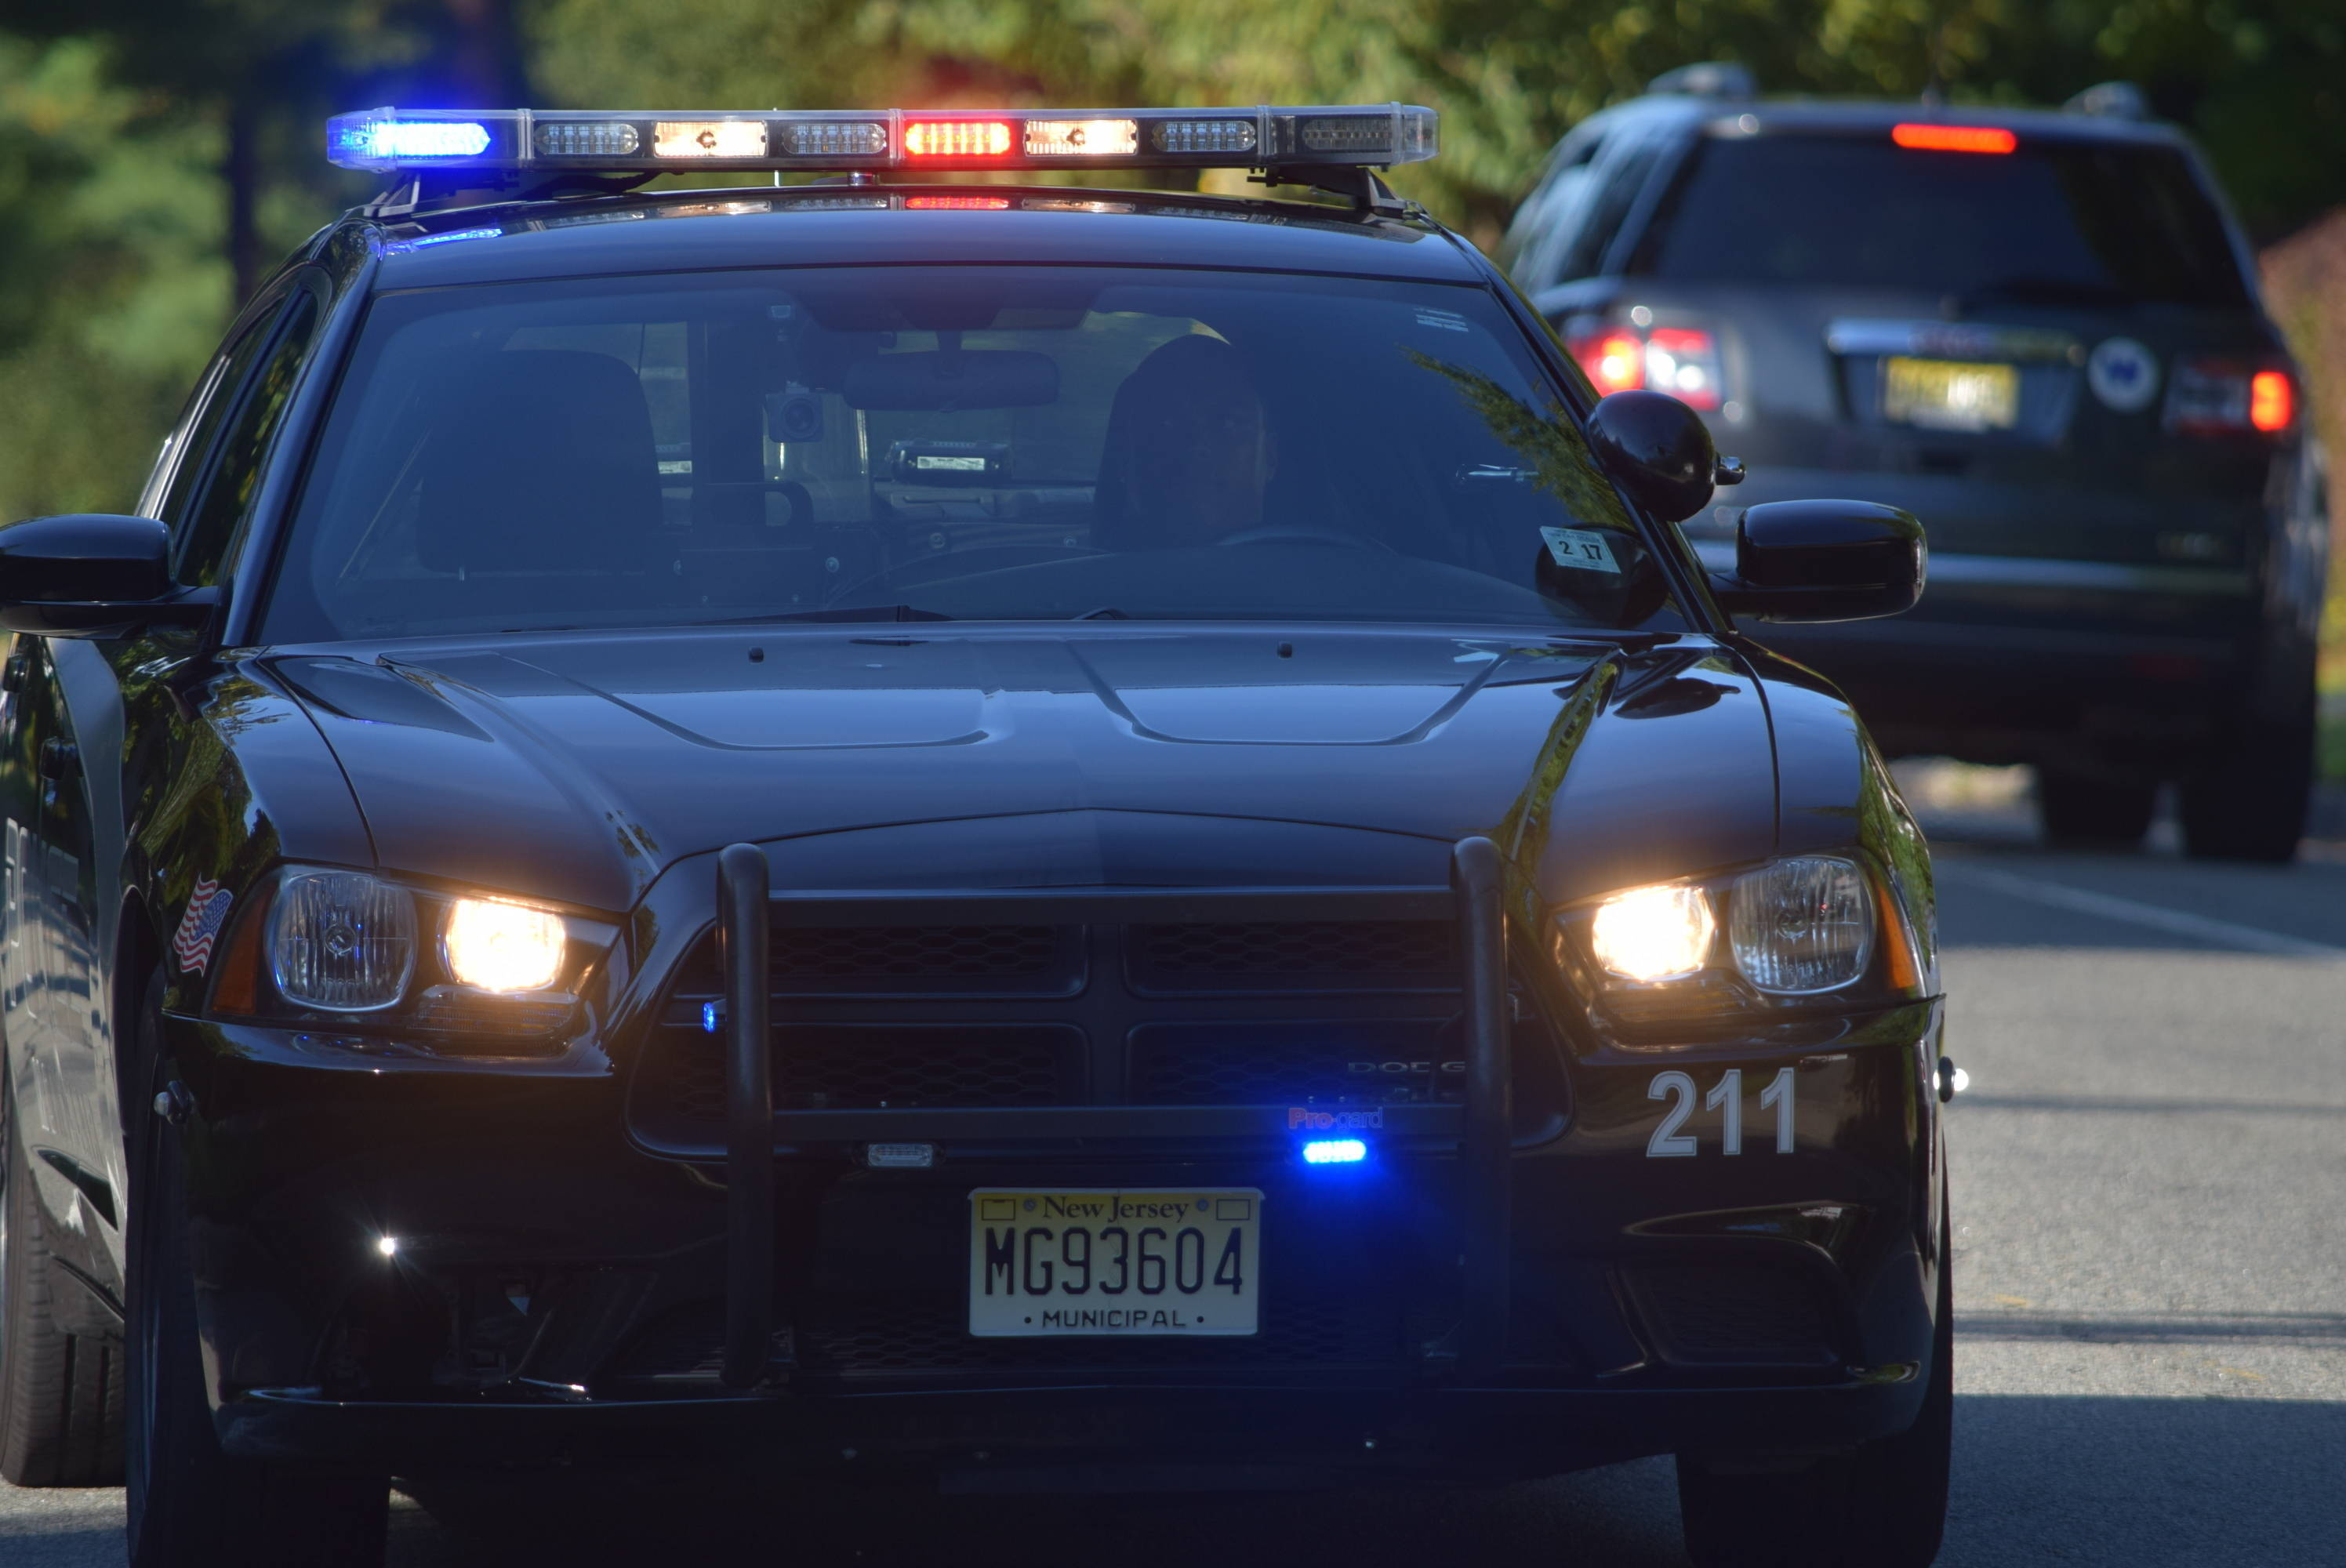 b255432e0b853db04f41_police_car.JPG